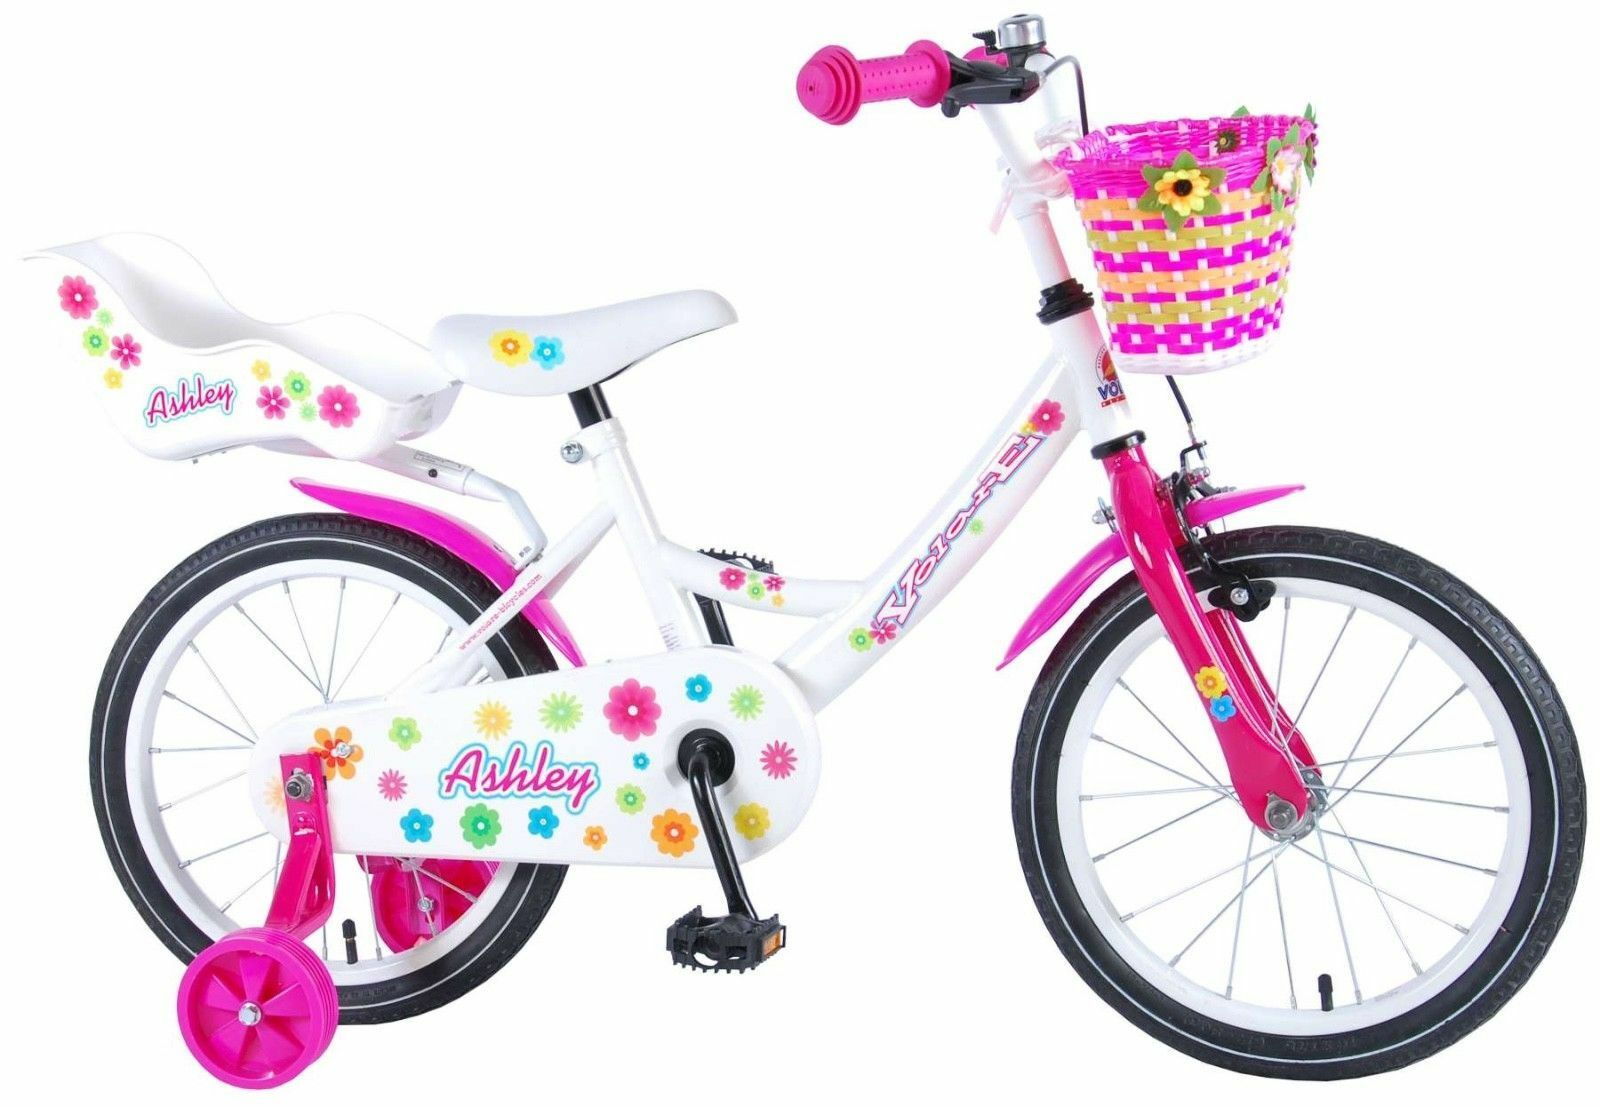 16 Zoll Fahrrad Rücktritt Stützräder Korb Kinderfahrrad Mädchen Blümchen 81604